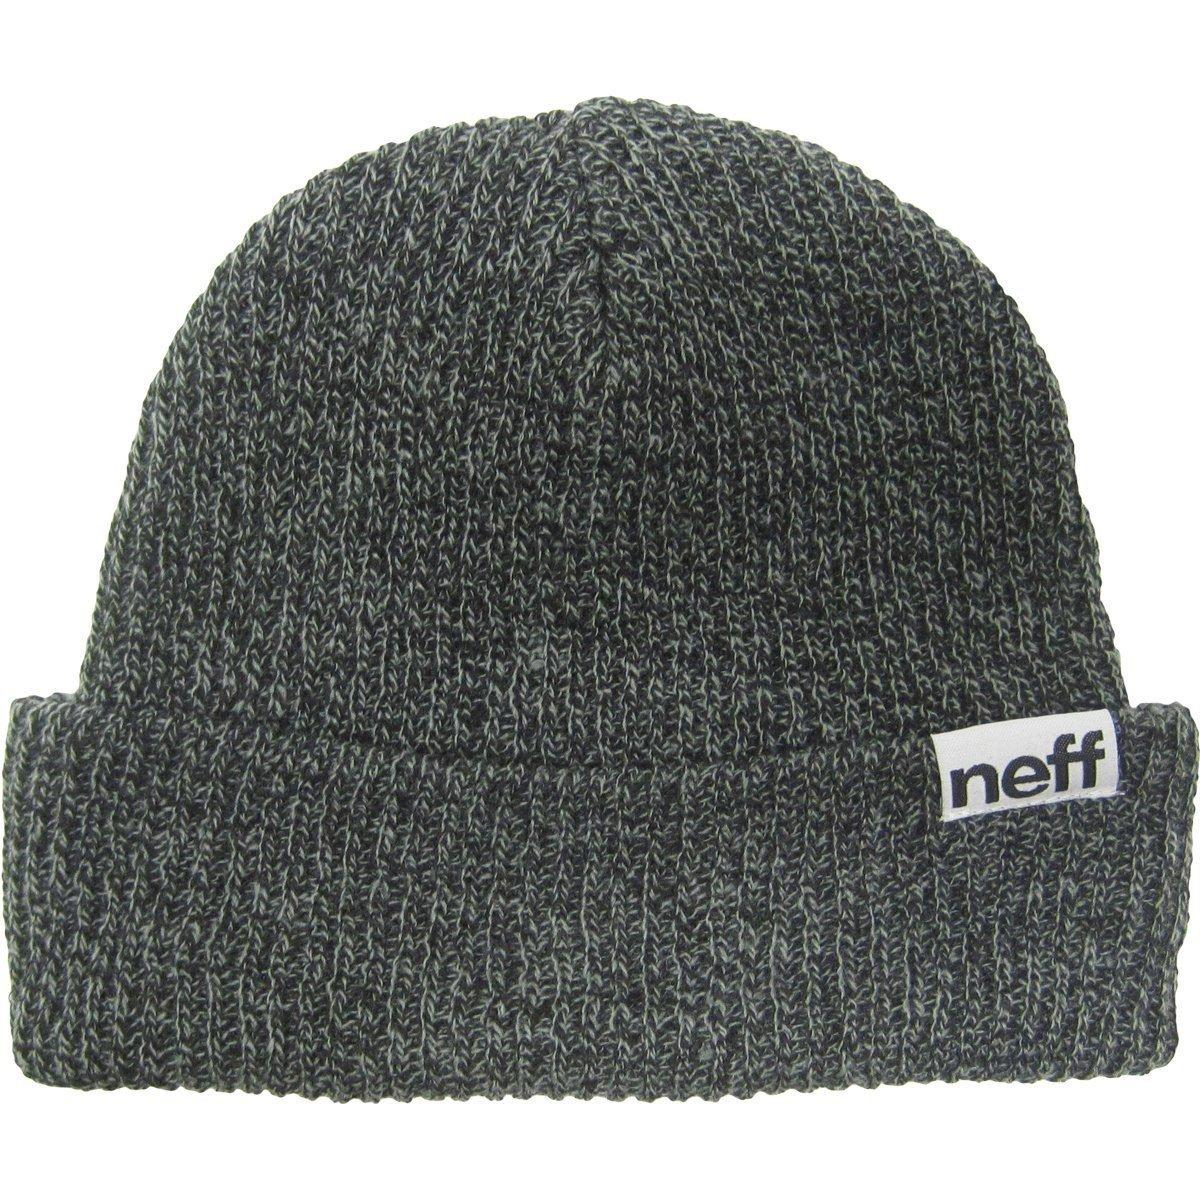 1412e257875 Amazon.com  Neff Mens Fold Heather Beanie Hat